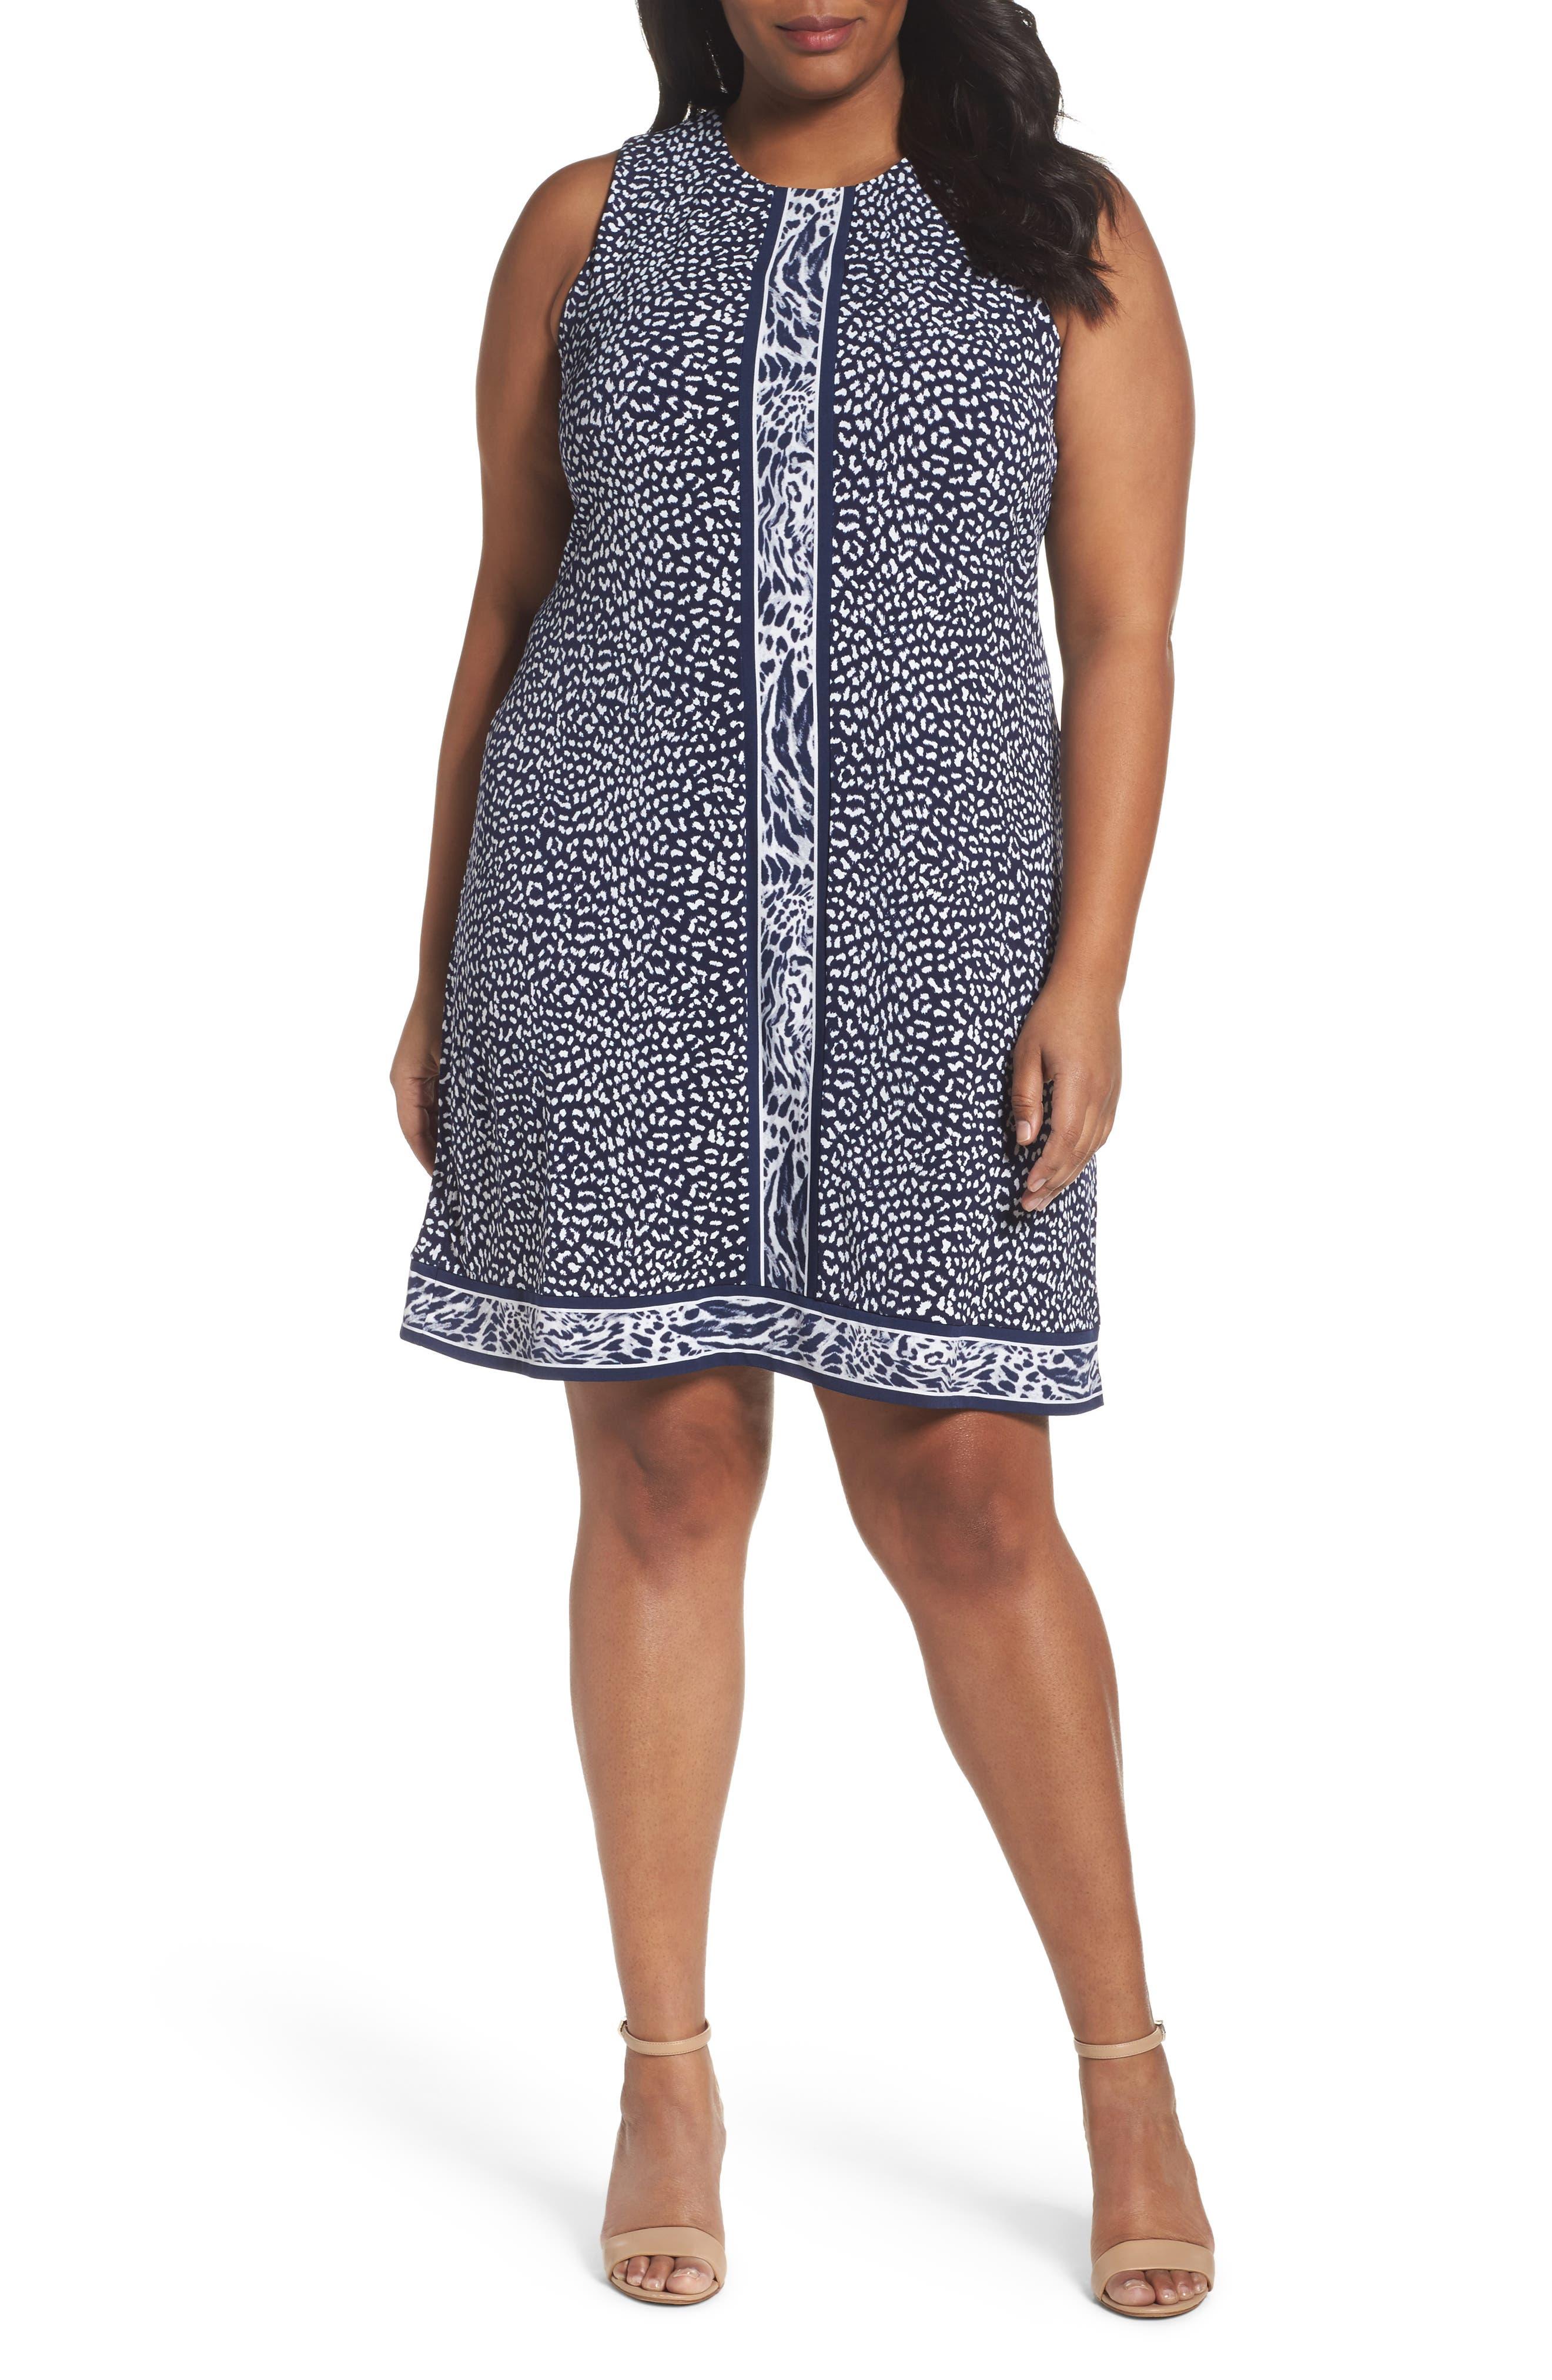 Alternate Image 1 Selected - MICHAEL Michael Kors Animal Print Sheath Dress (Plus Size)